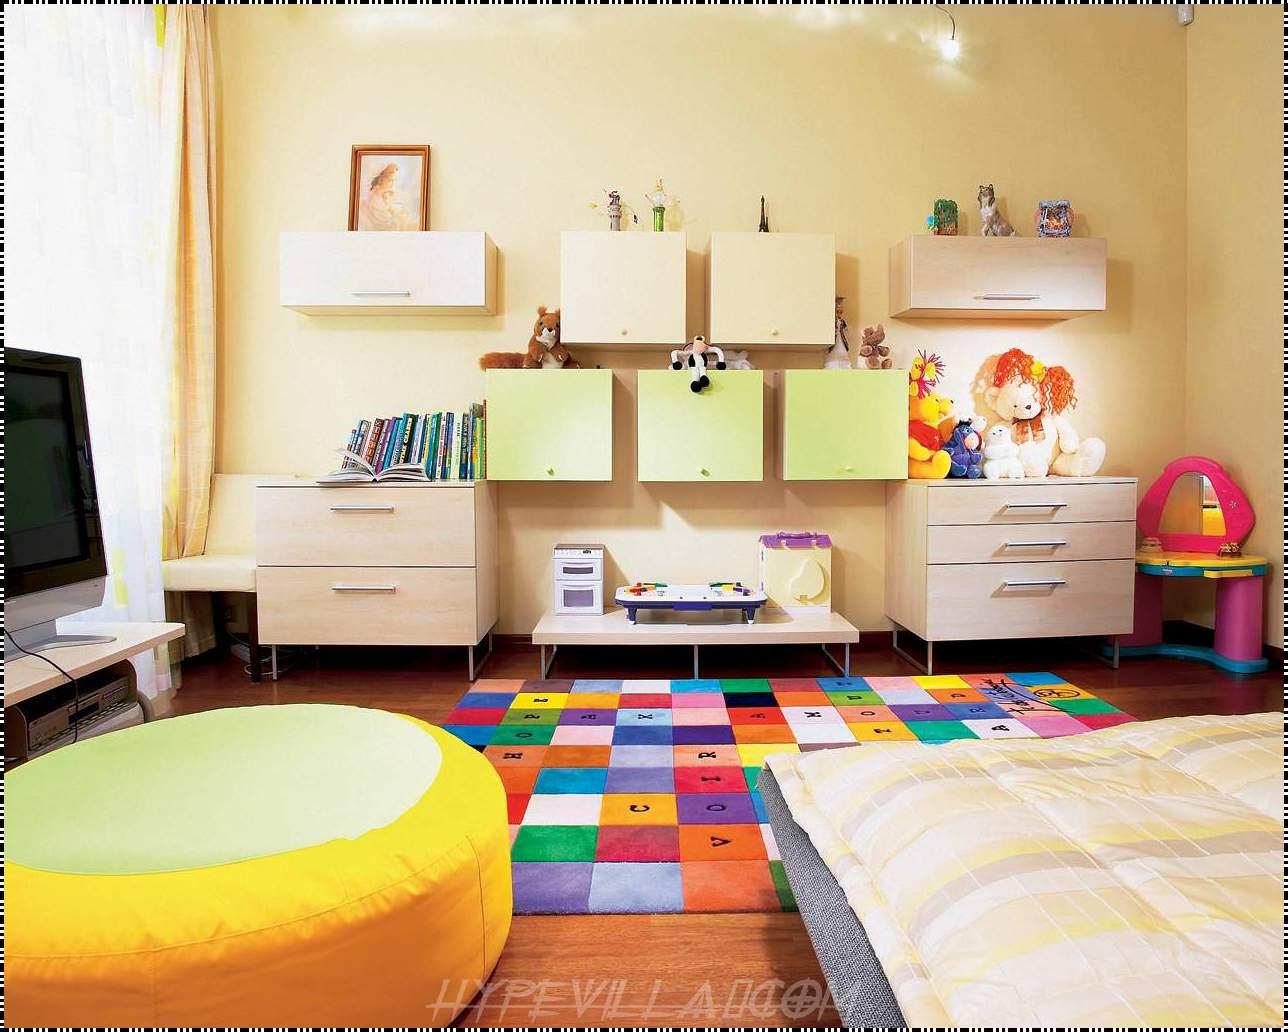 retro-inspiring-kids-room-unique-house-plans-interior-decors